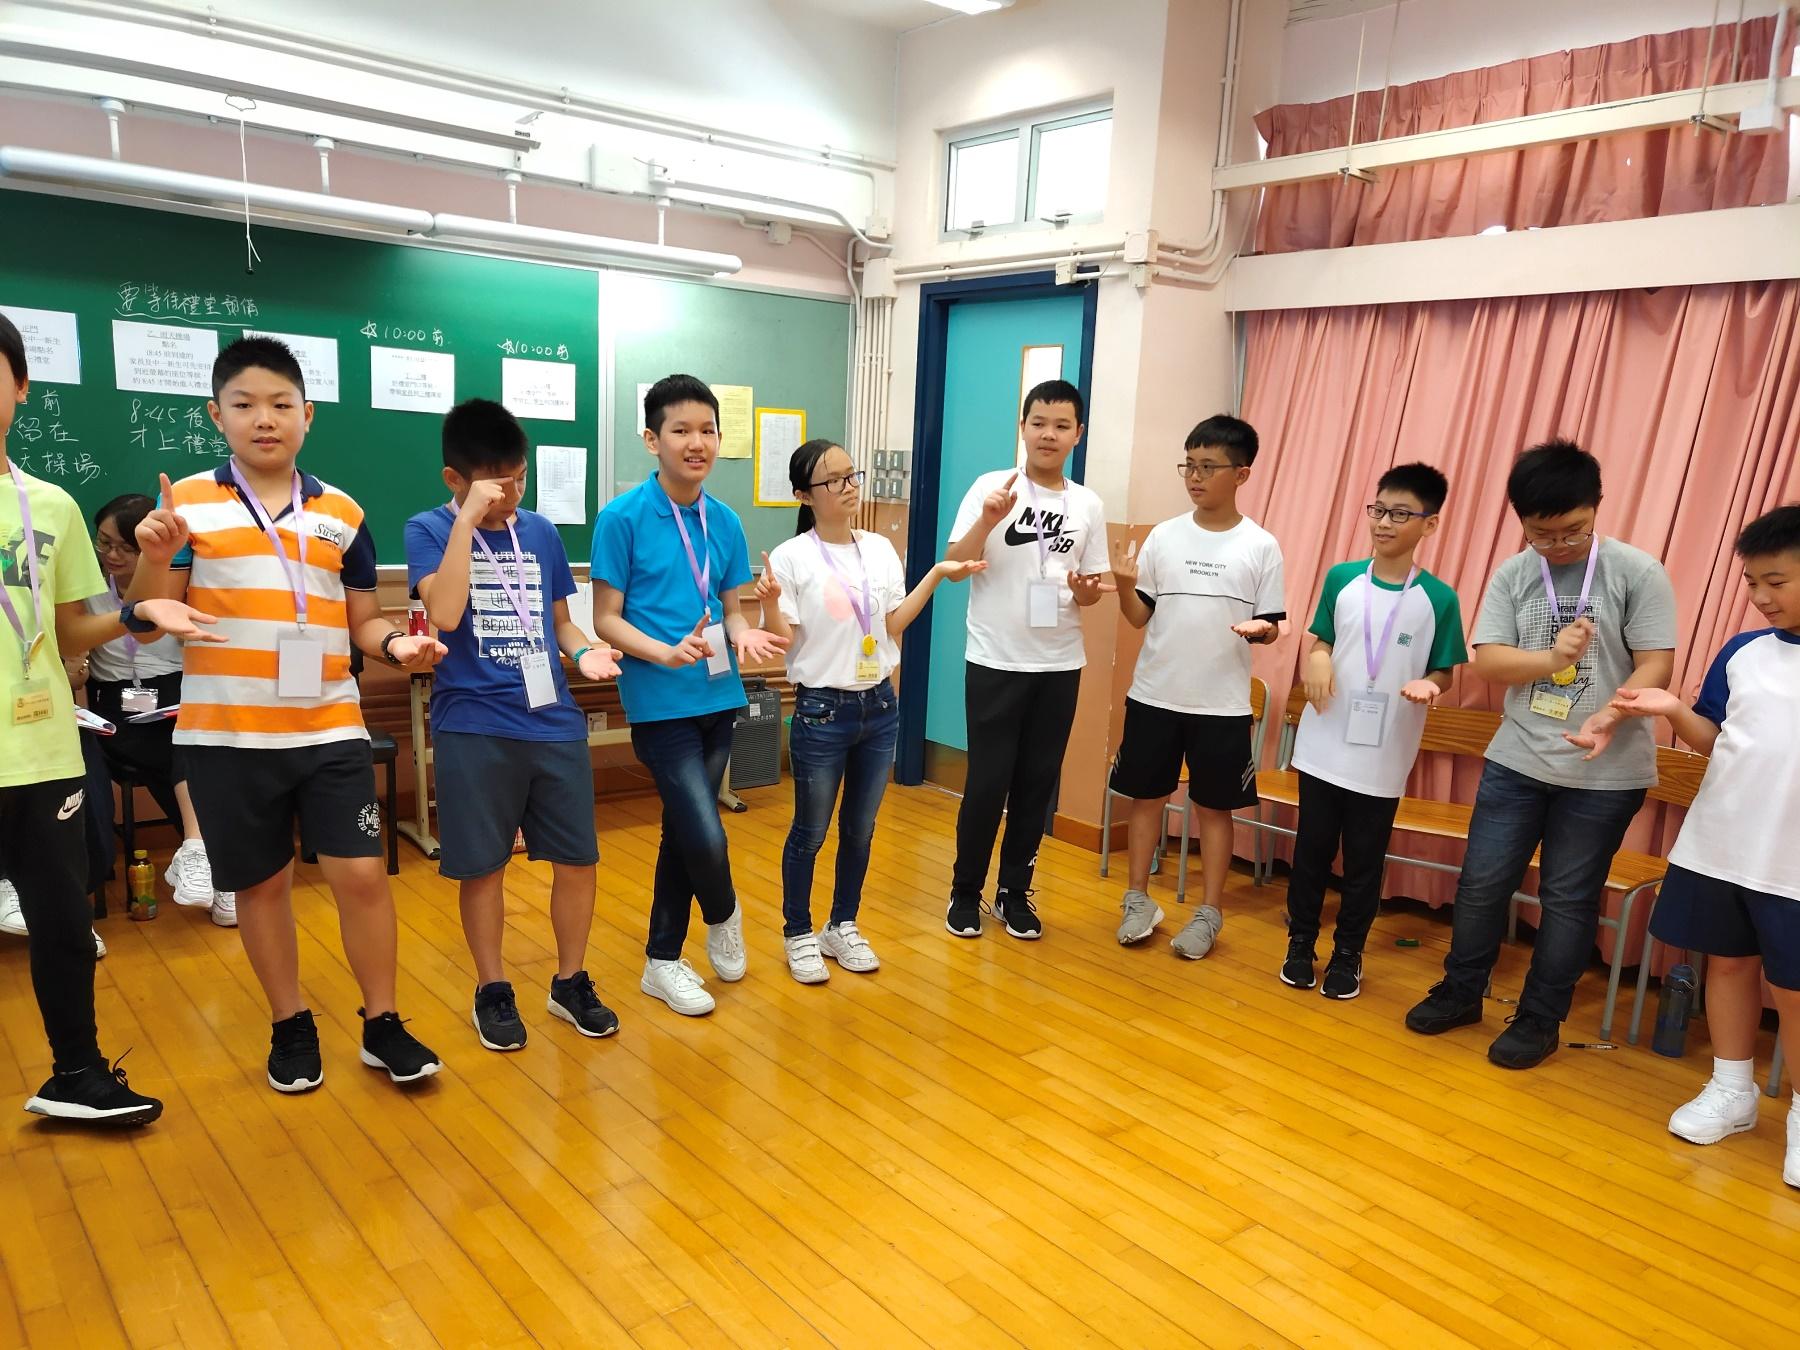 http://npc.edu.hk/sites/default/files/img_20190812_102410.jpg